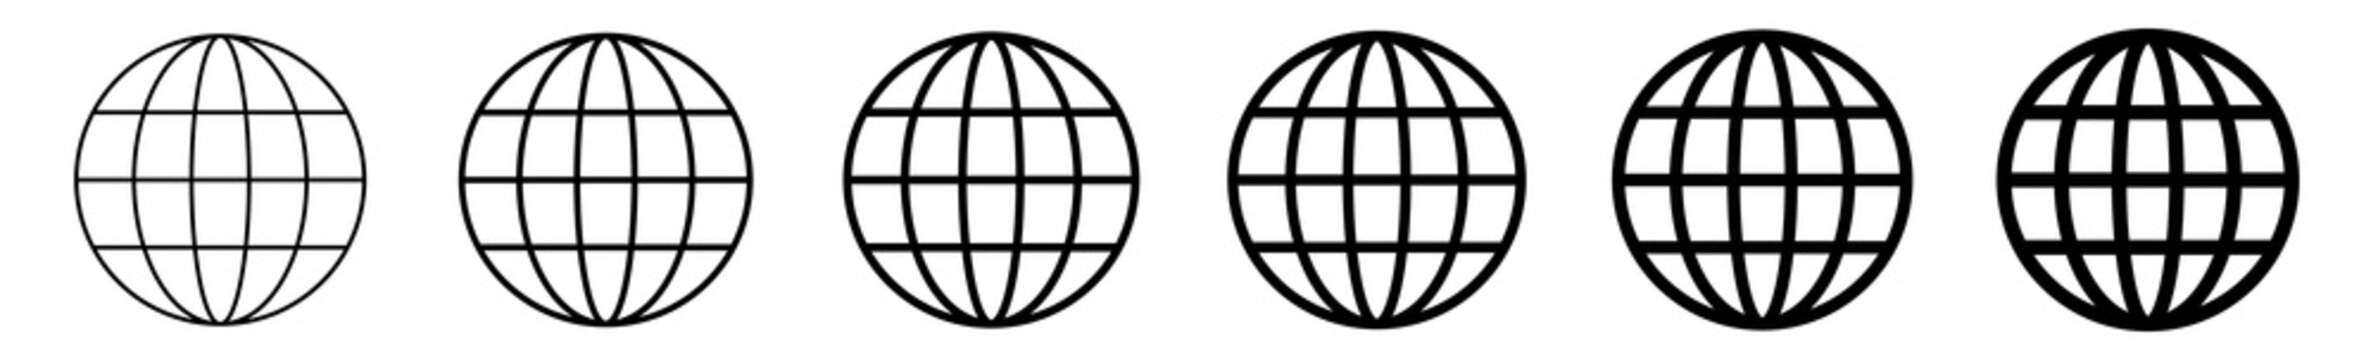 World Icon Black | Earth Illustration | Globe Symbol | Planet Logo | World Wide Web Sign | Isolated | Variations